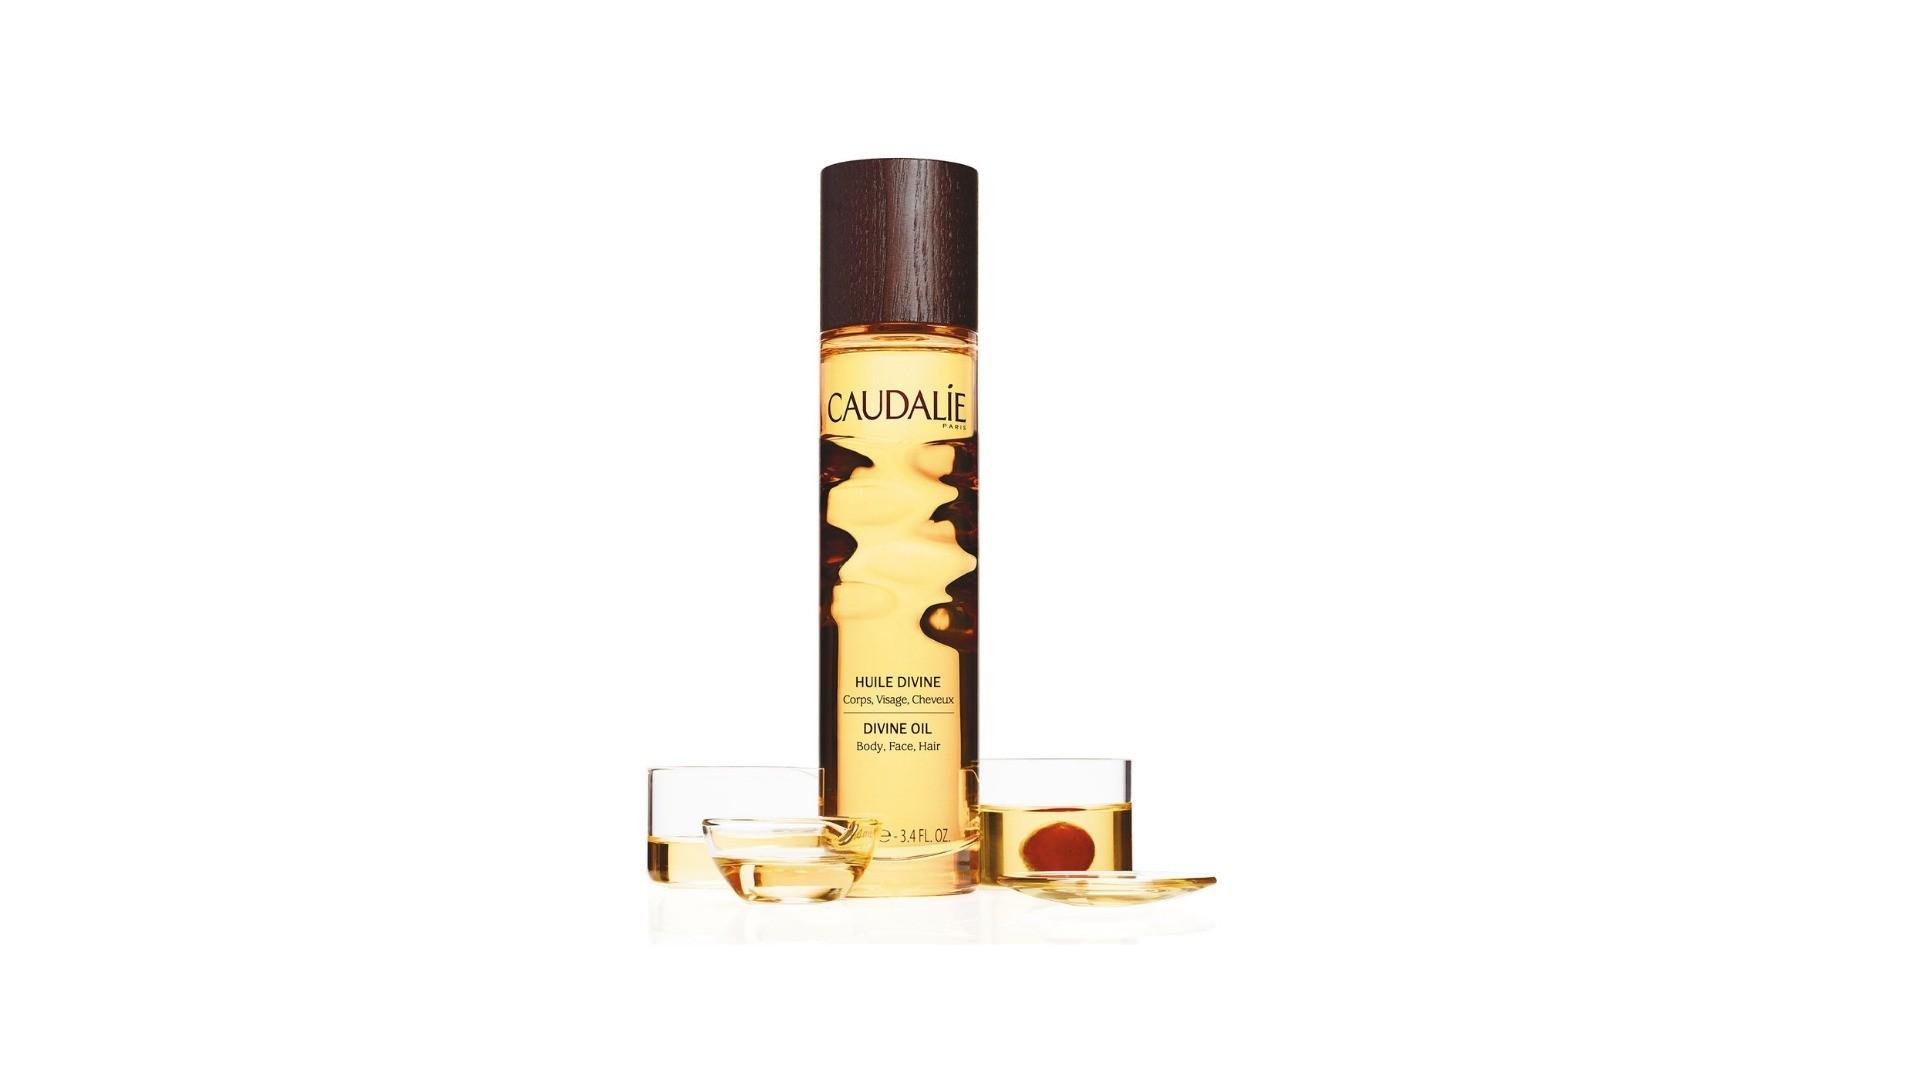 Божественное масло Divine Oil, Caudalie